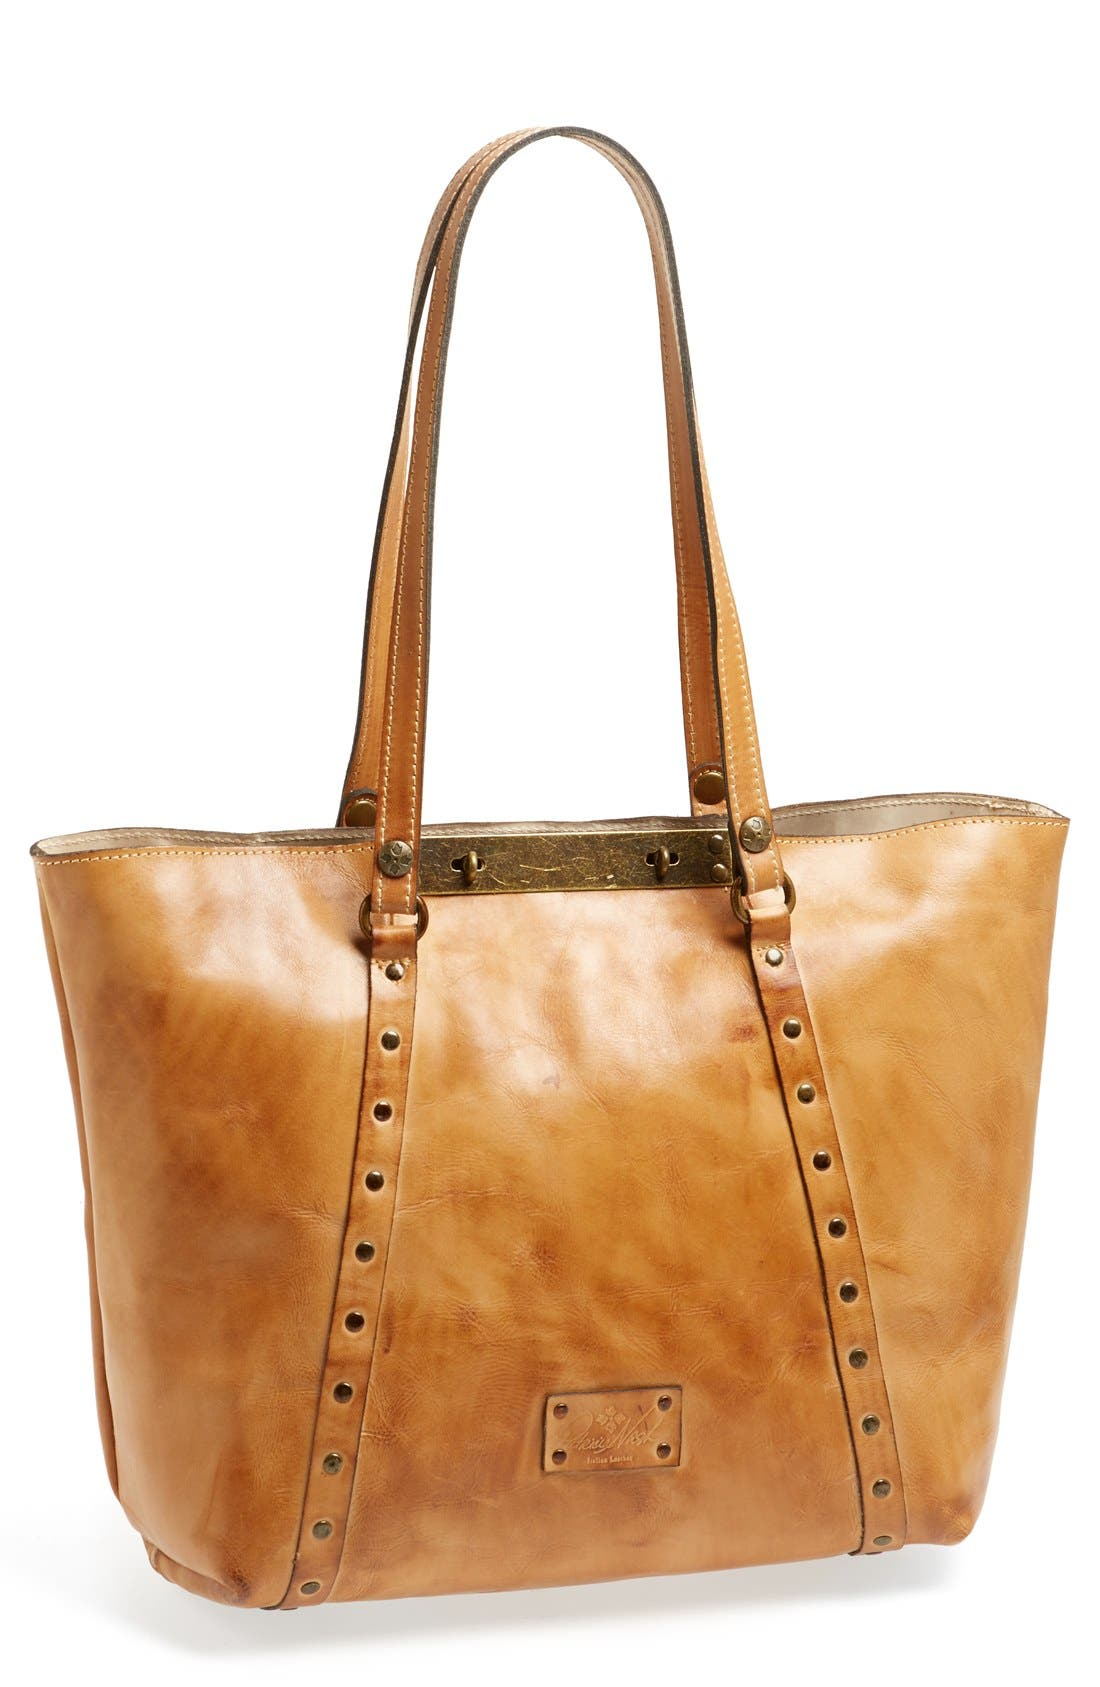 Alternate Image 1 Selected - Patricia Nash 'Benvenuto' Leather Tote